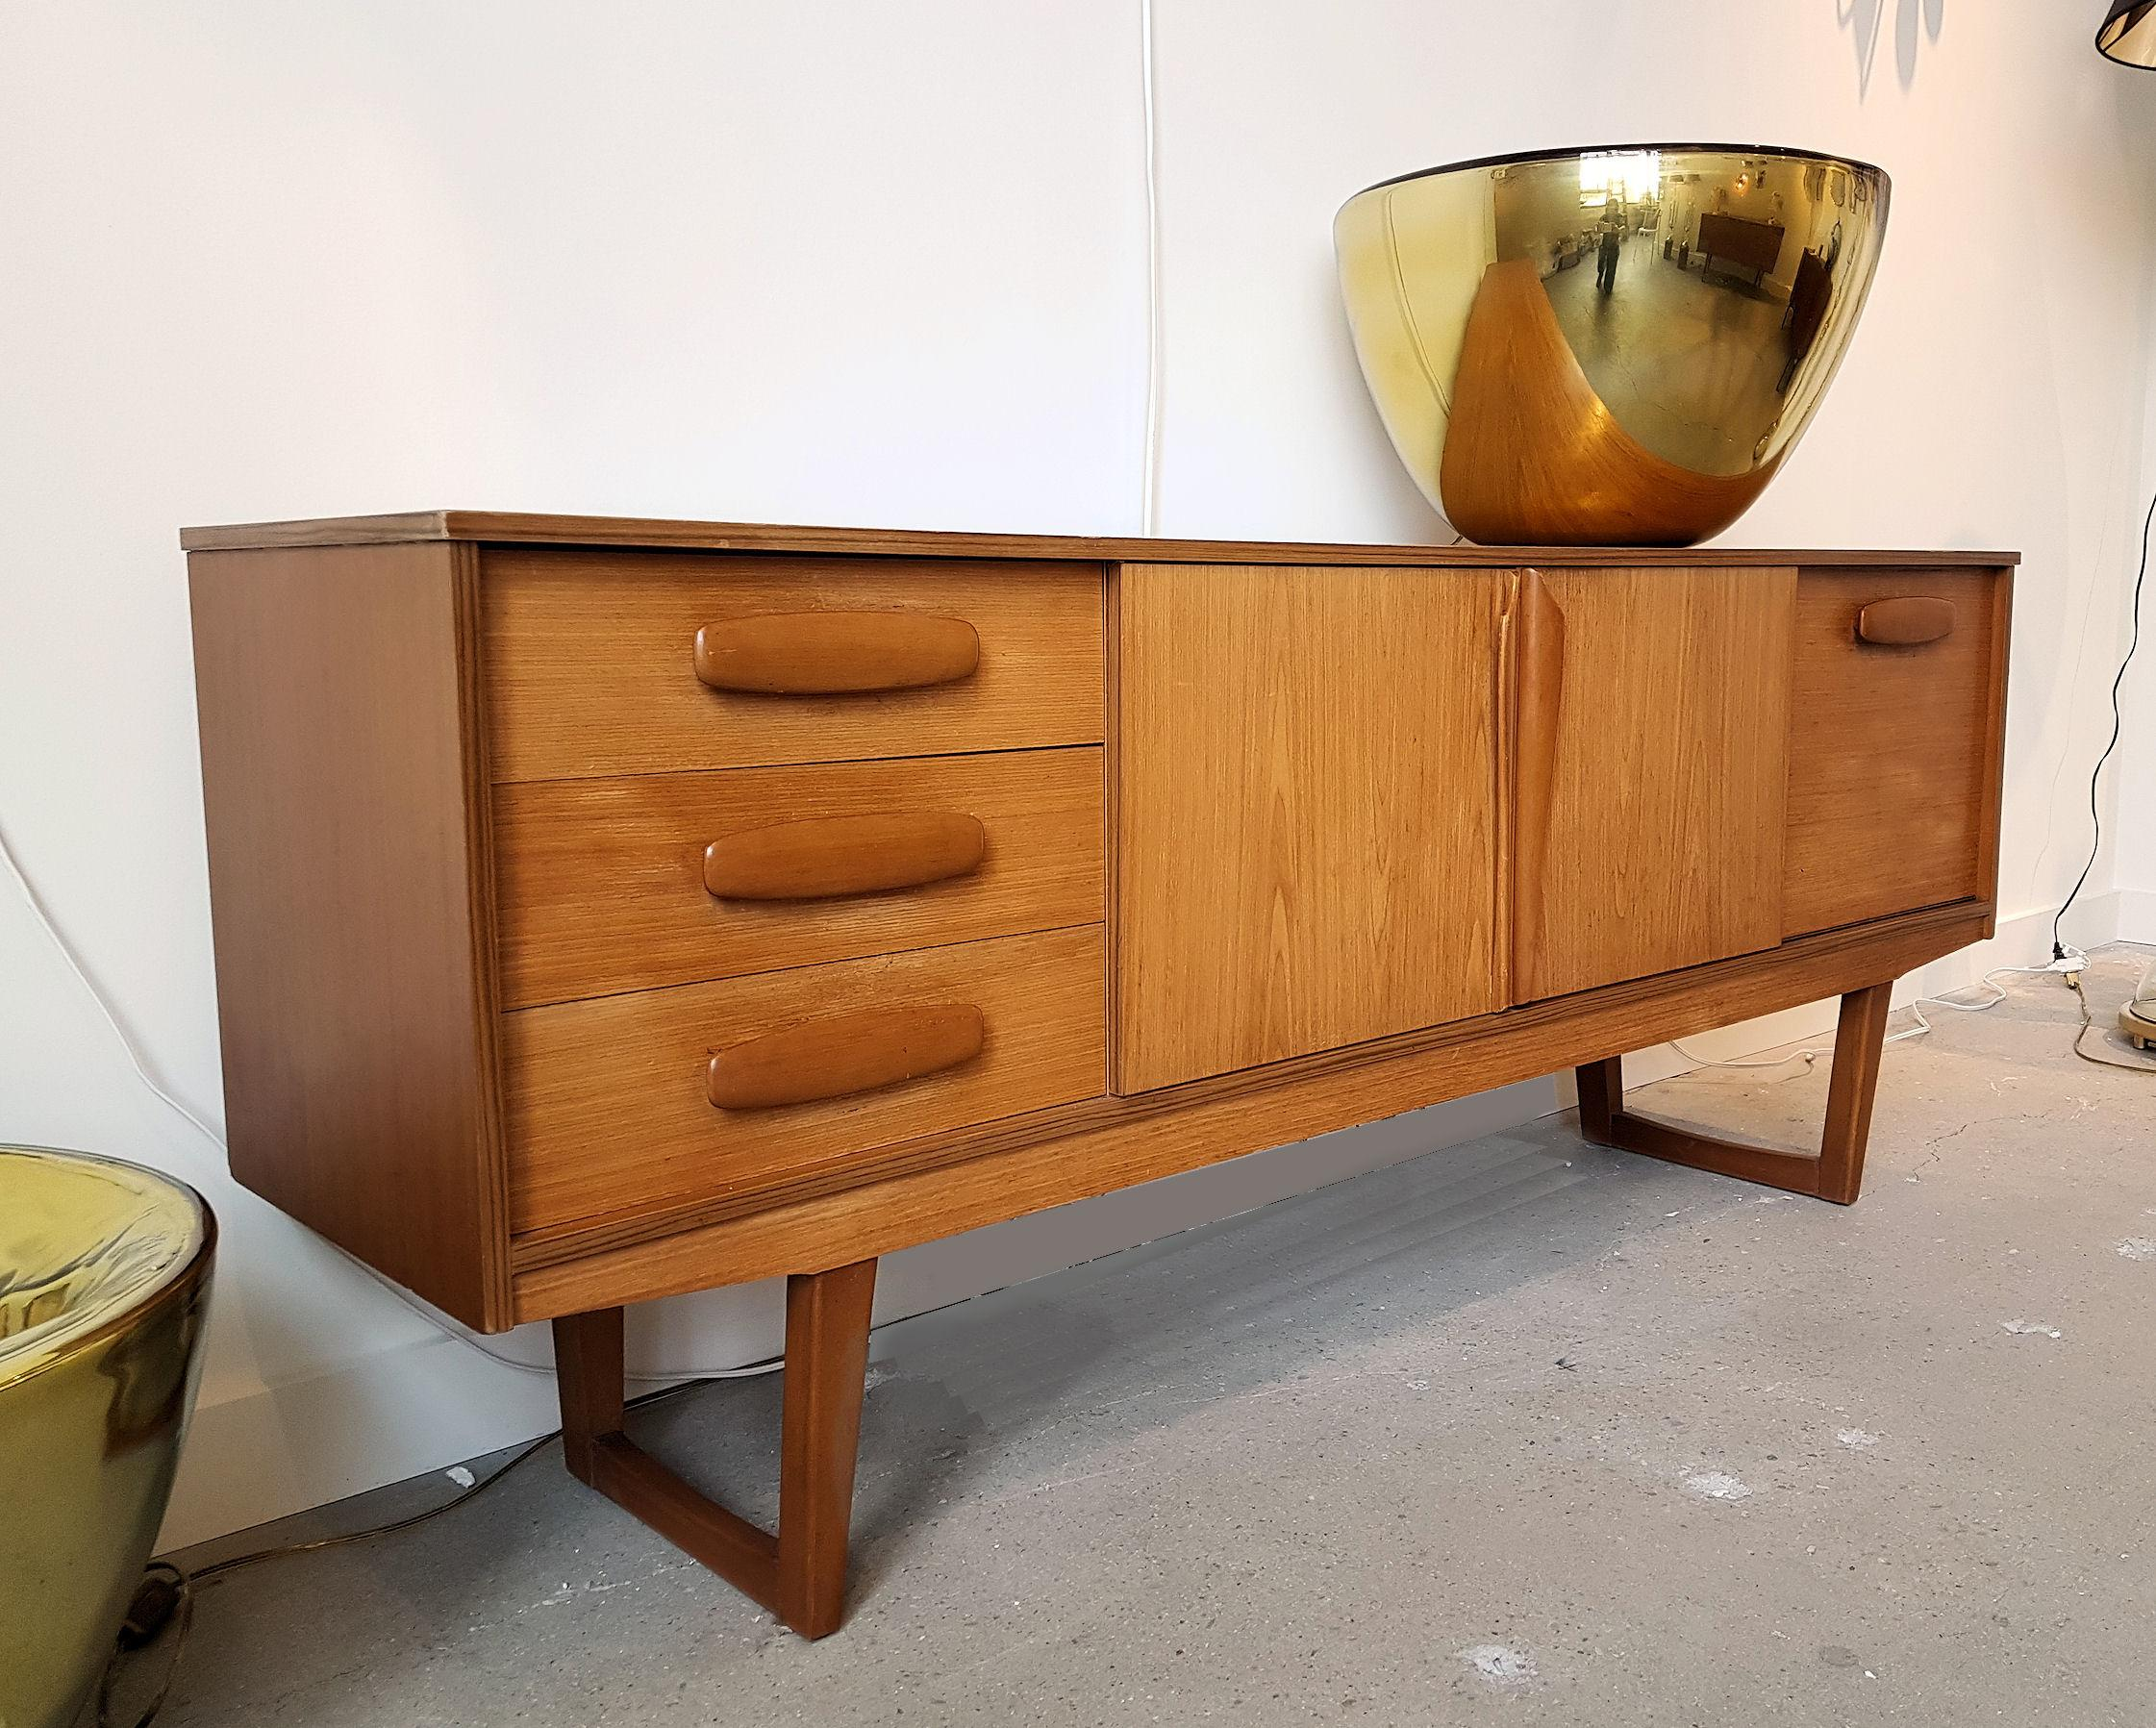 Mid Century Modern Danish Credenza : Mid century modern danish clear cherrywood sideboard or credenza